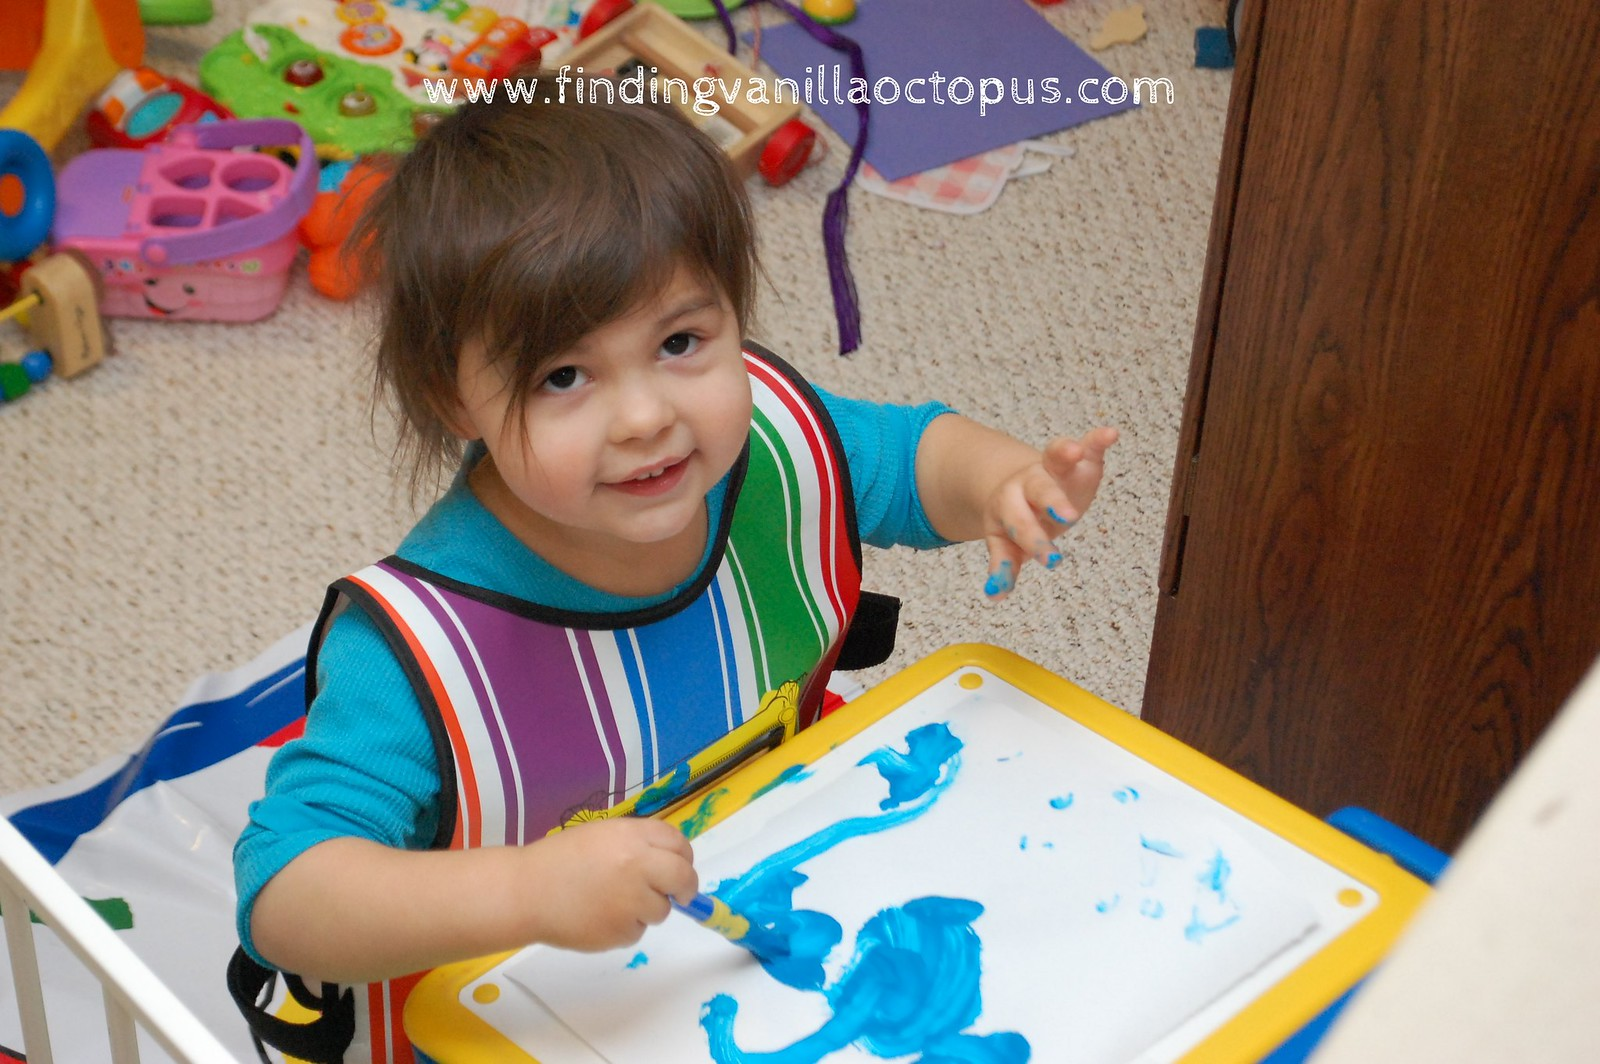 gambarmemek online image share.com $$ Kindergarten panty peeks